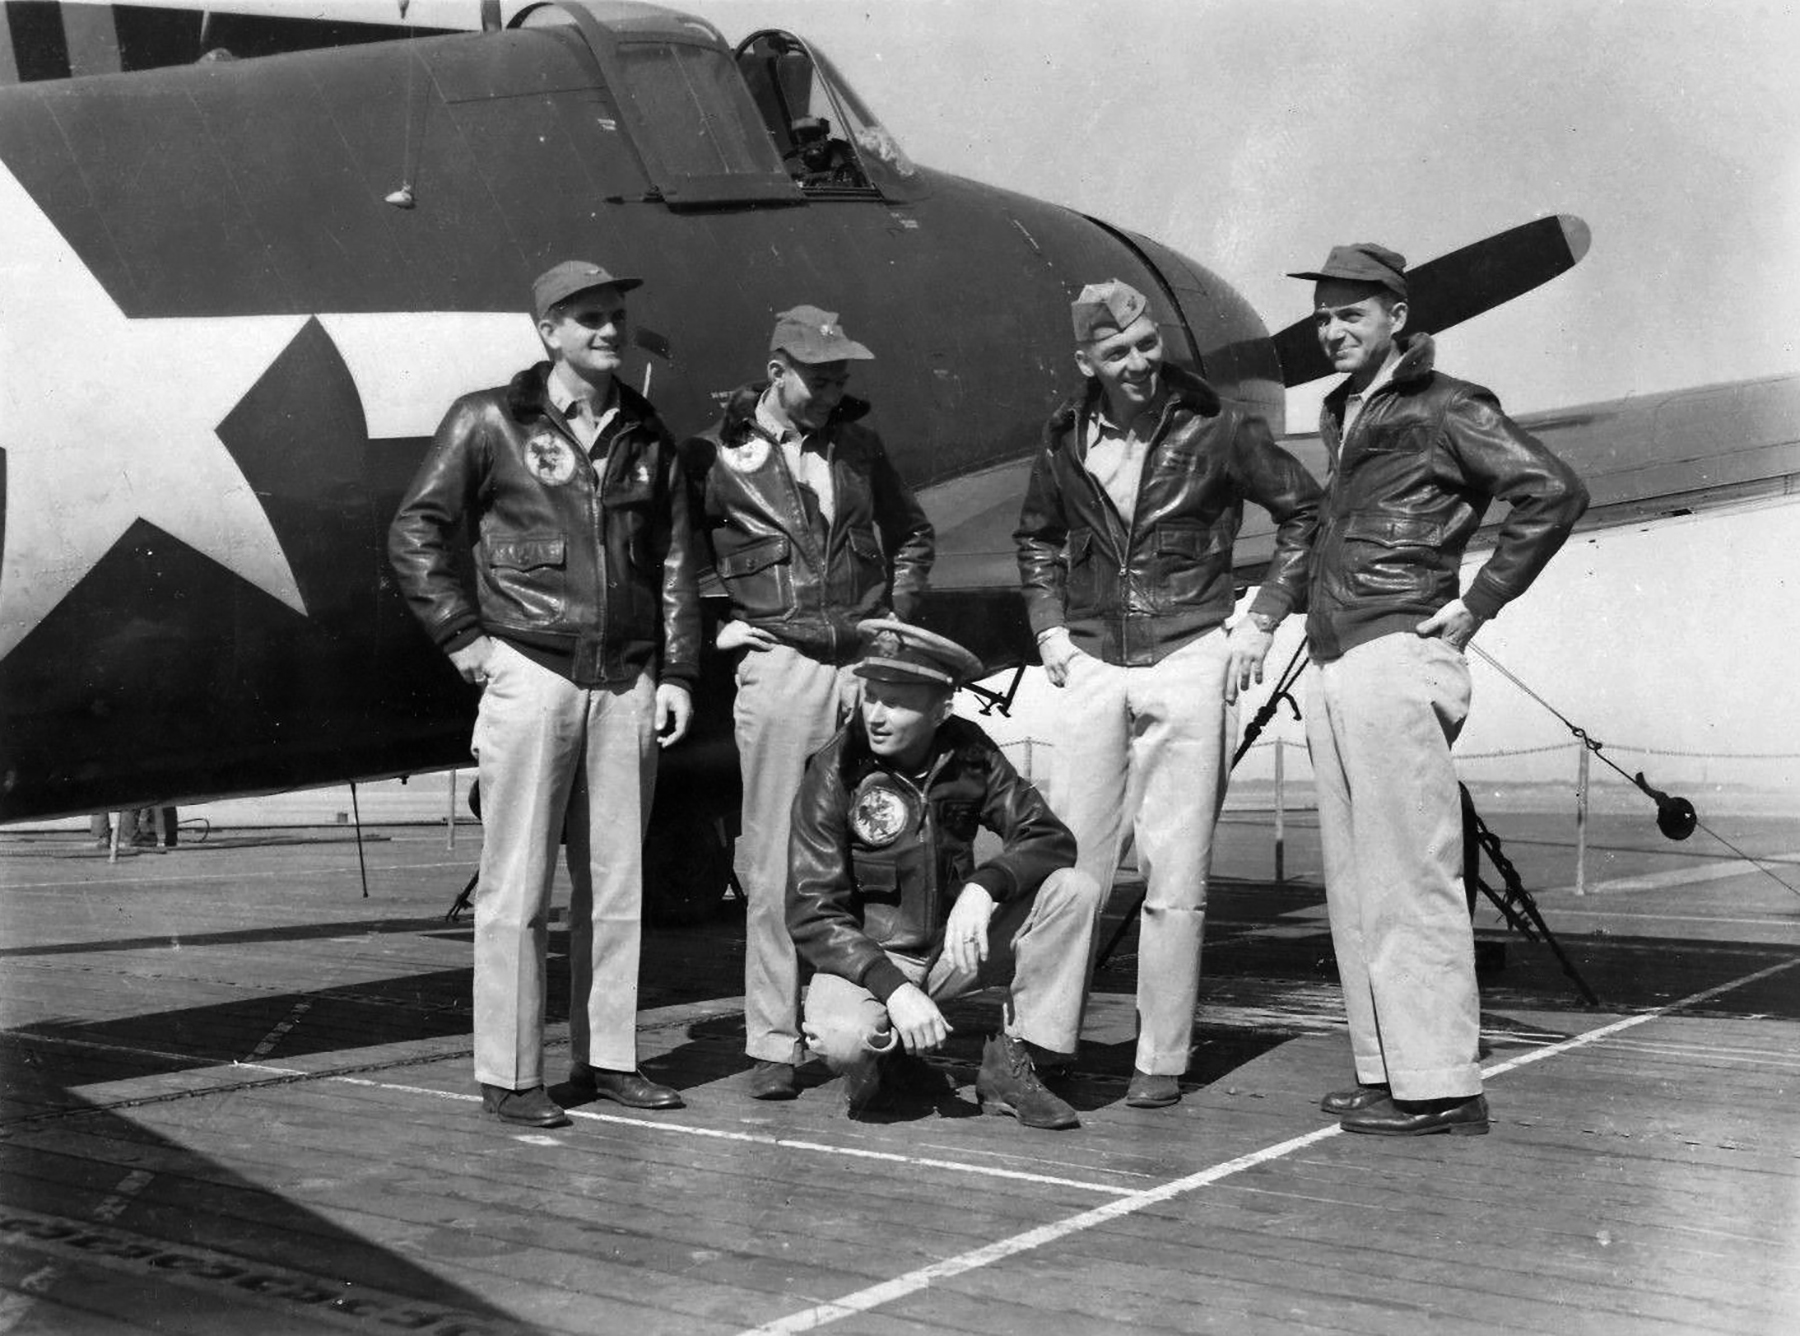 Grumman F6F 5 Hellcat VF 36 White xx CVE 112 USS Siboney Aug 1945 May 1946 01